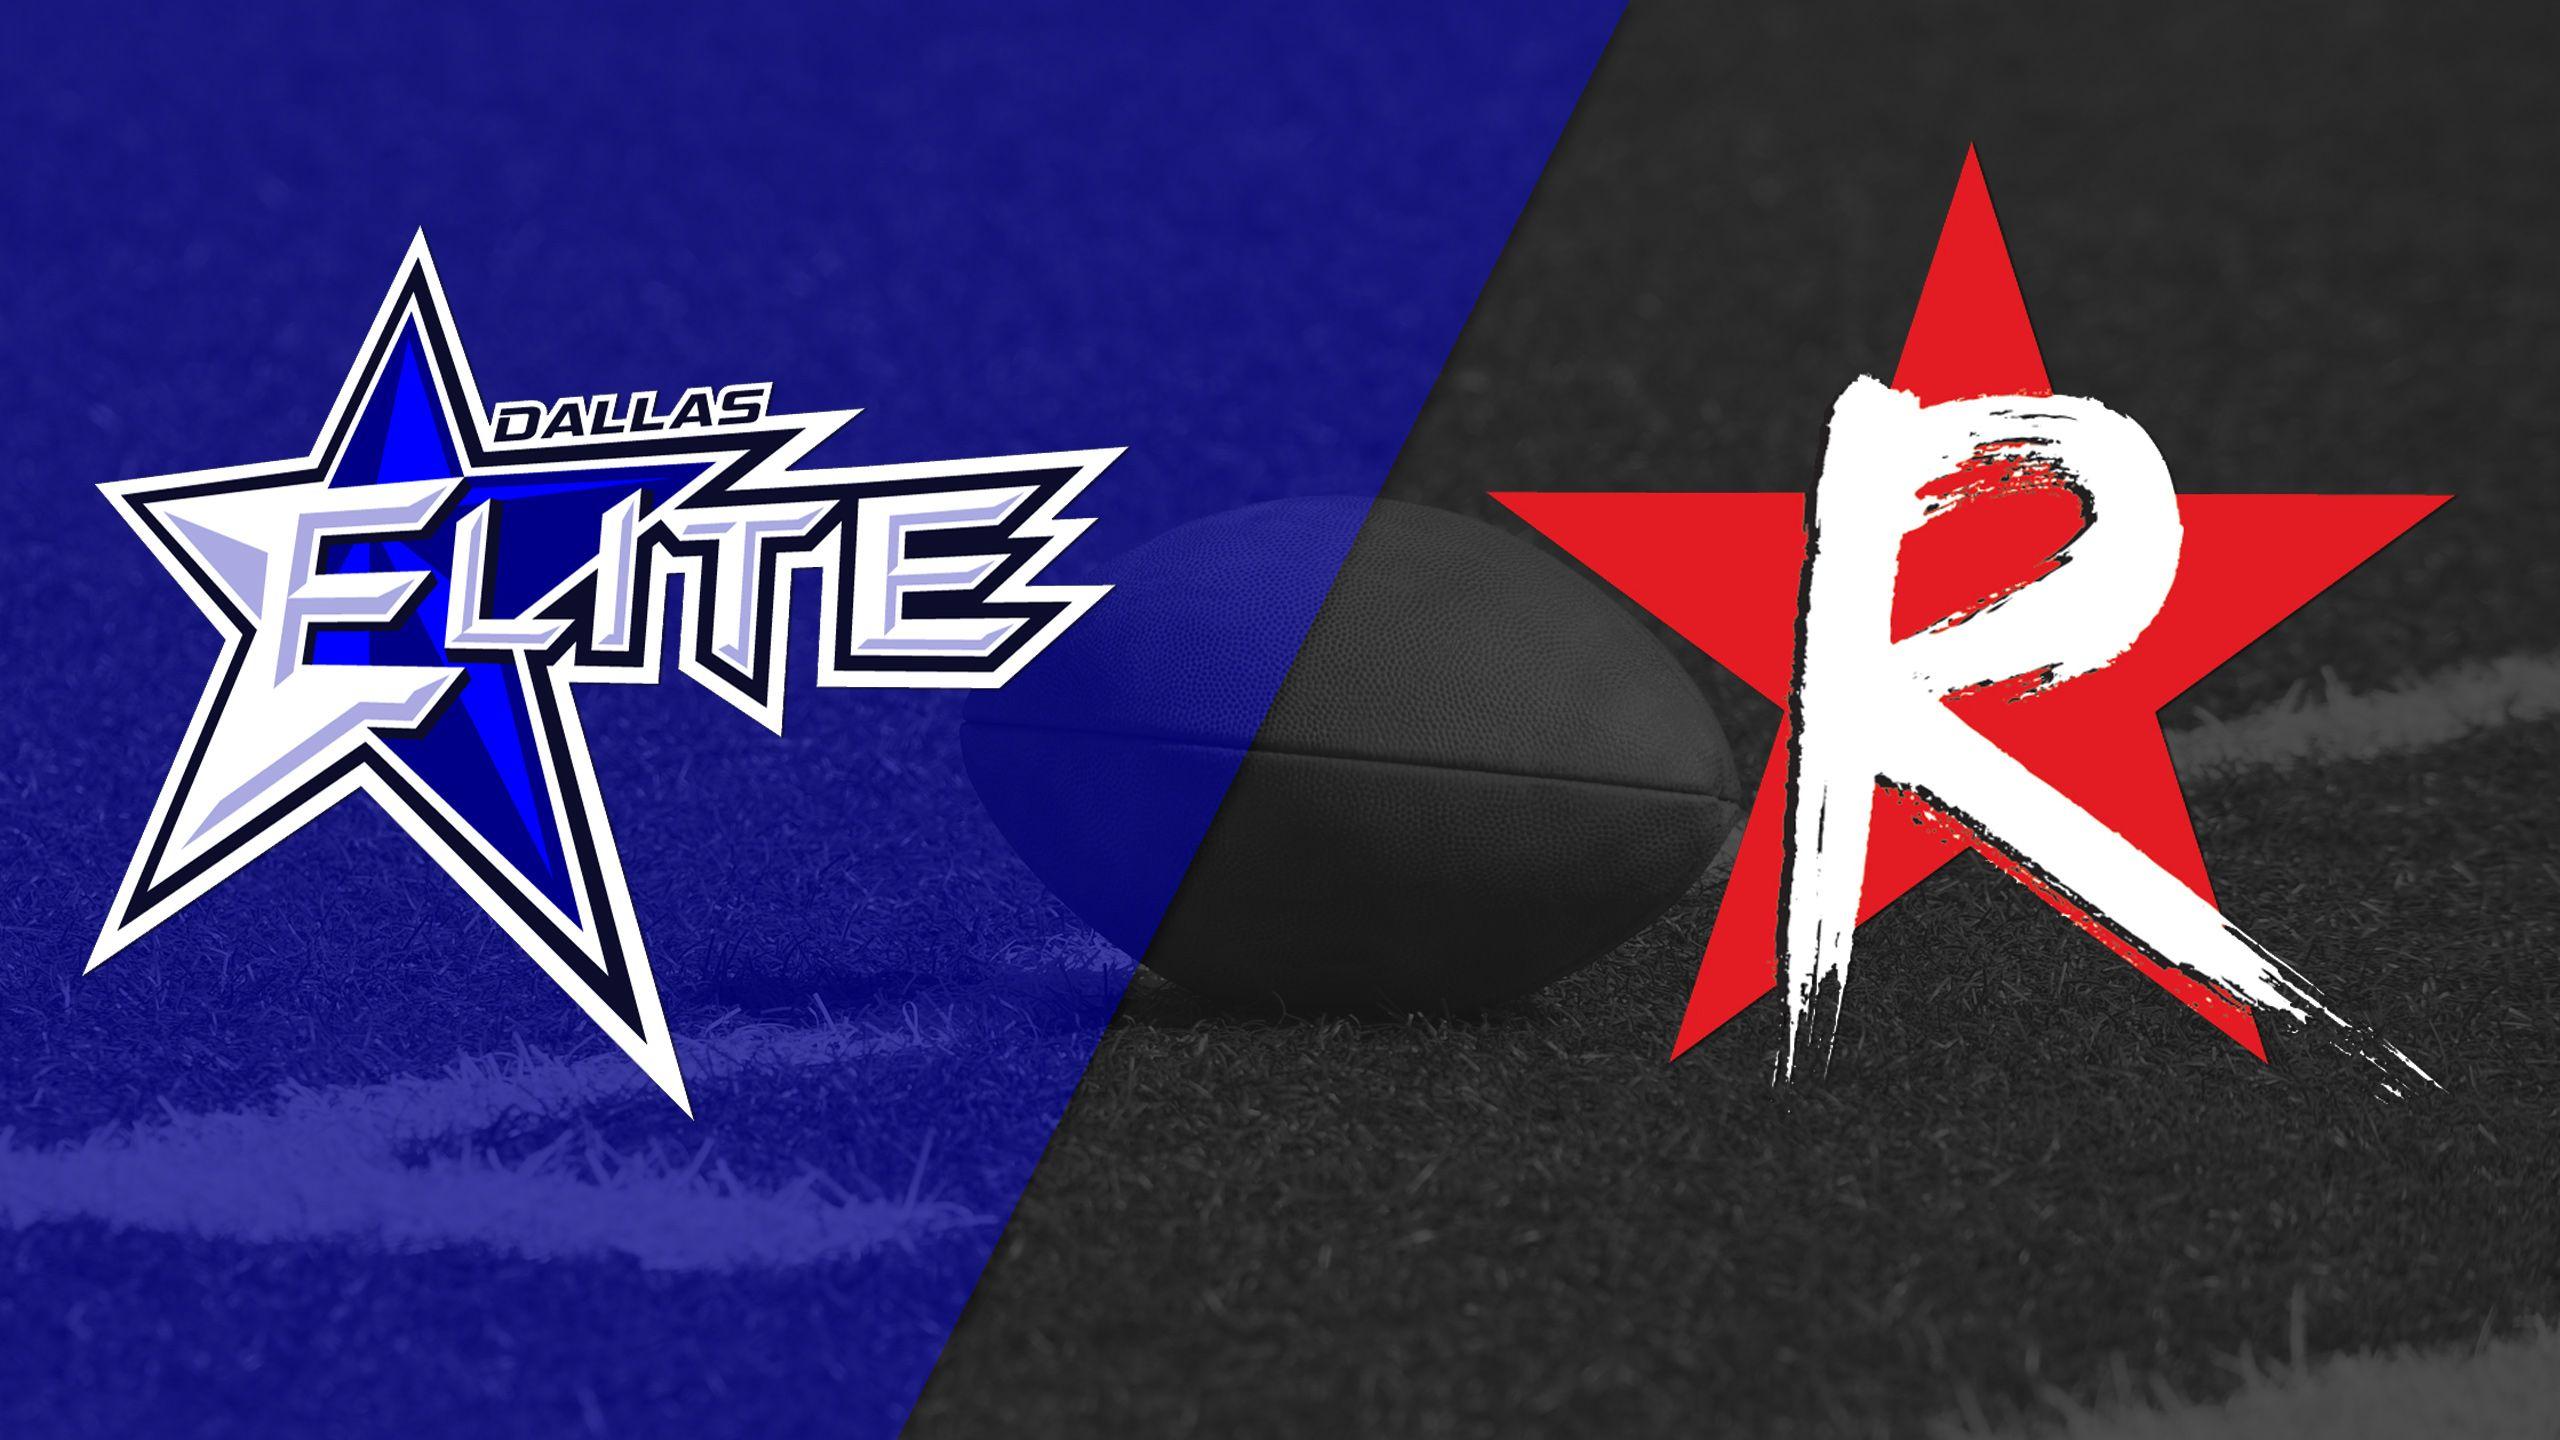 Dallas Elite vs. Boston Renegades (The W Bowl)